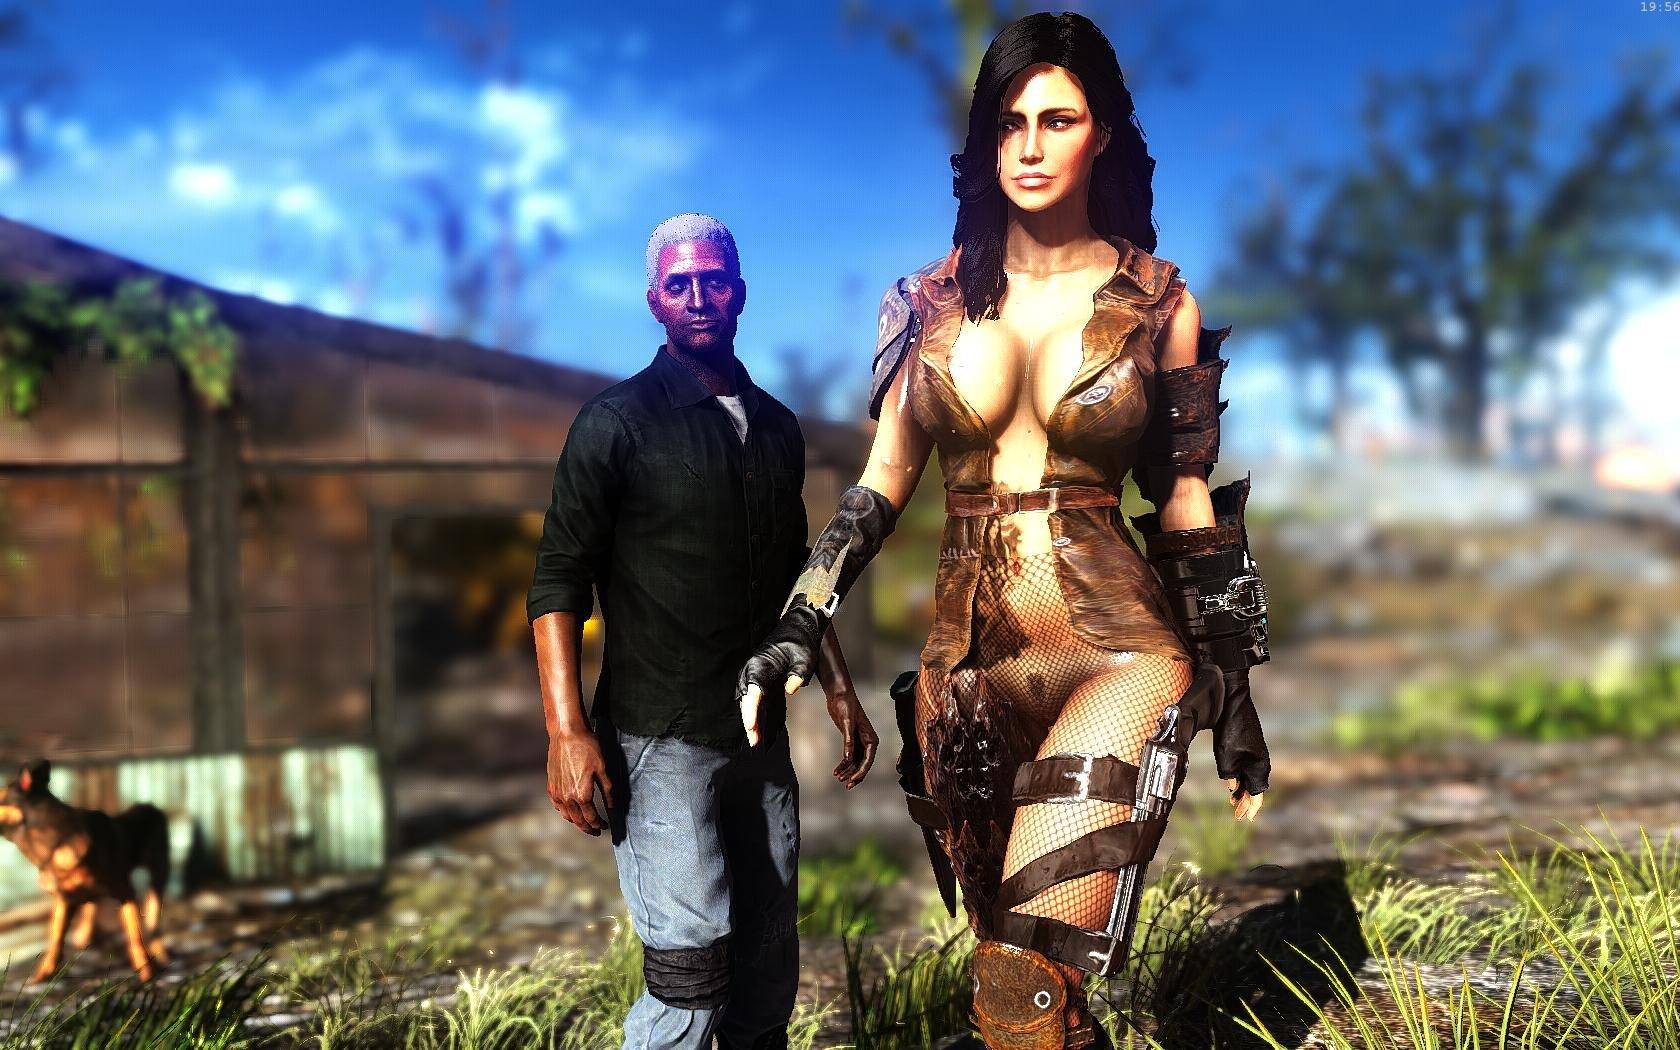 Fallout4 2019-02-03 19-56-33-02